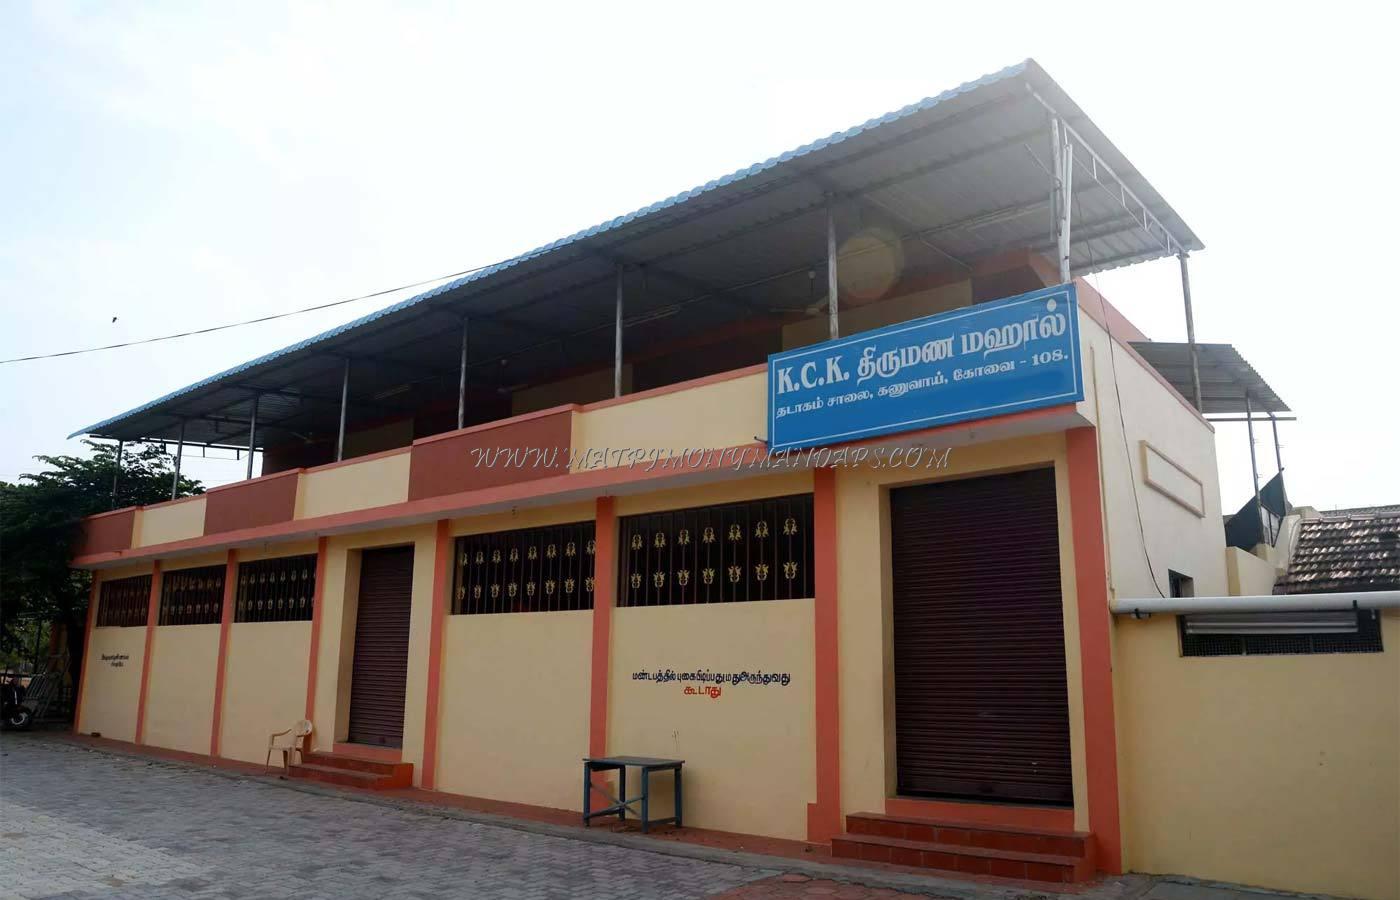 Find More Kalyana Mandapams in Vadamadurai